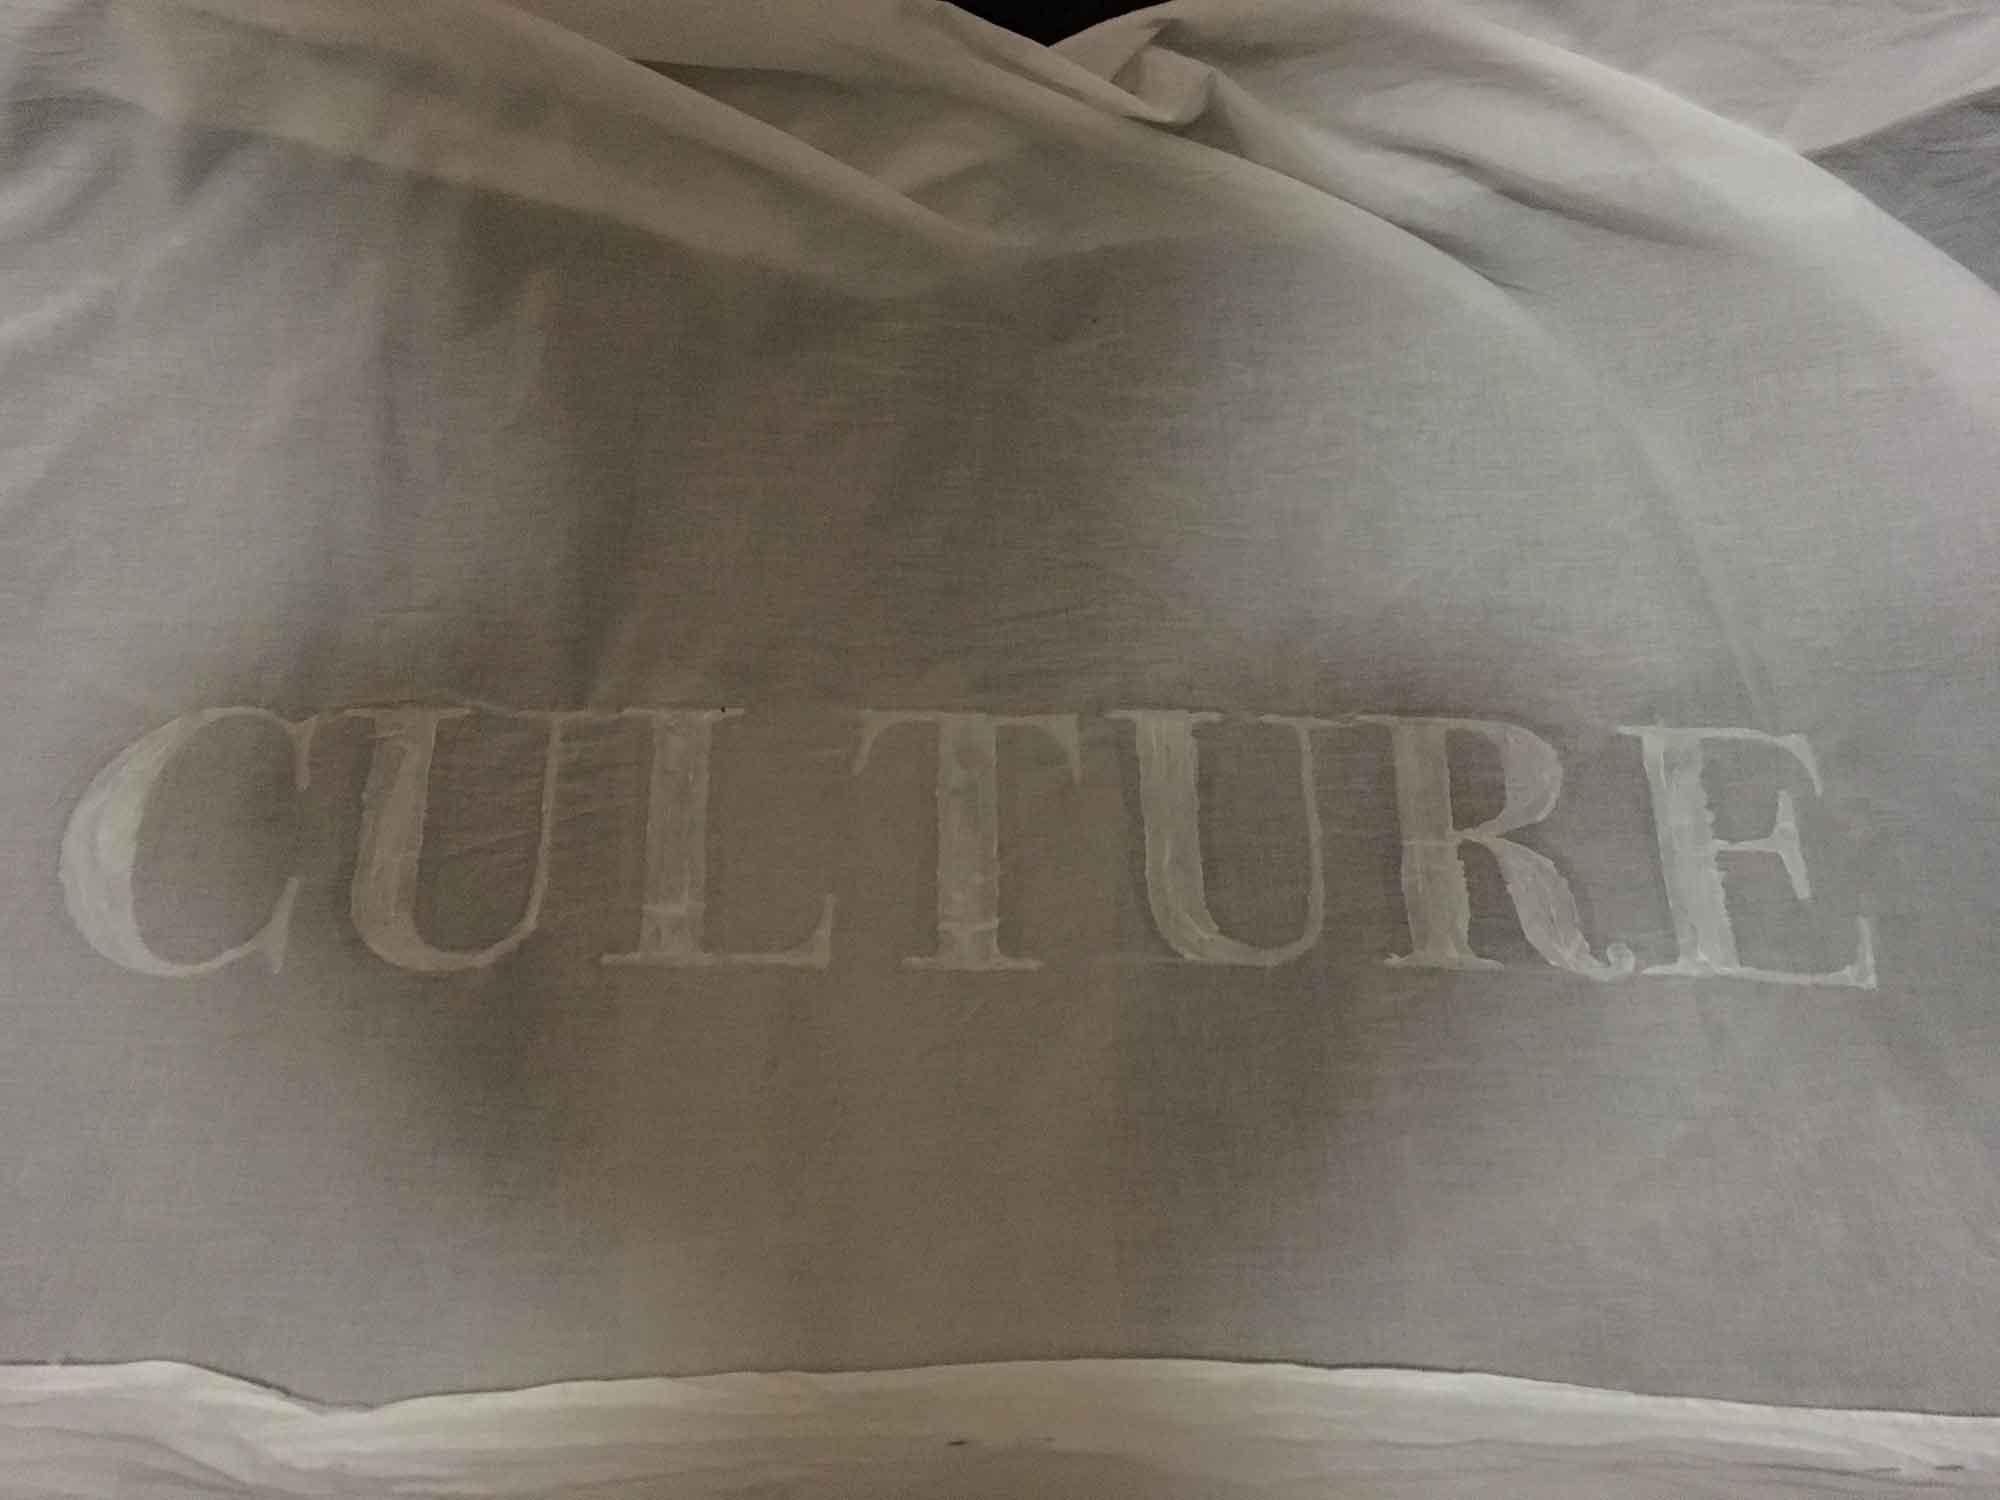 culture (written)